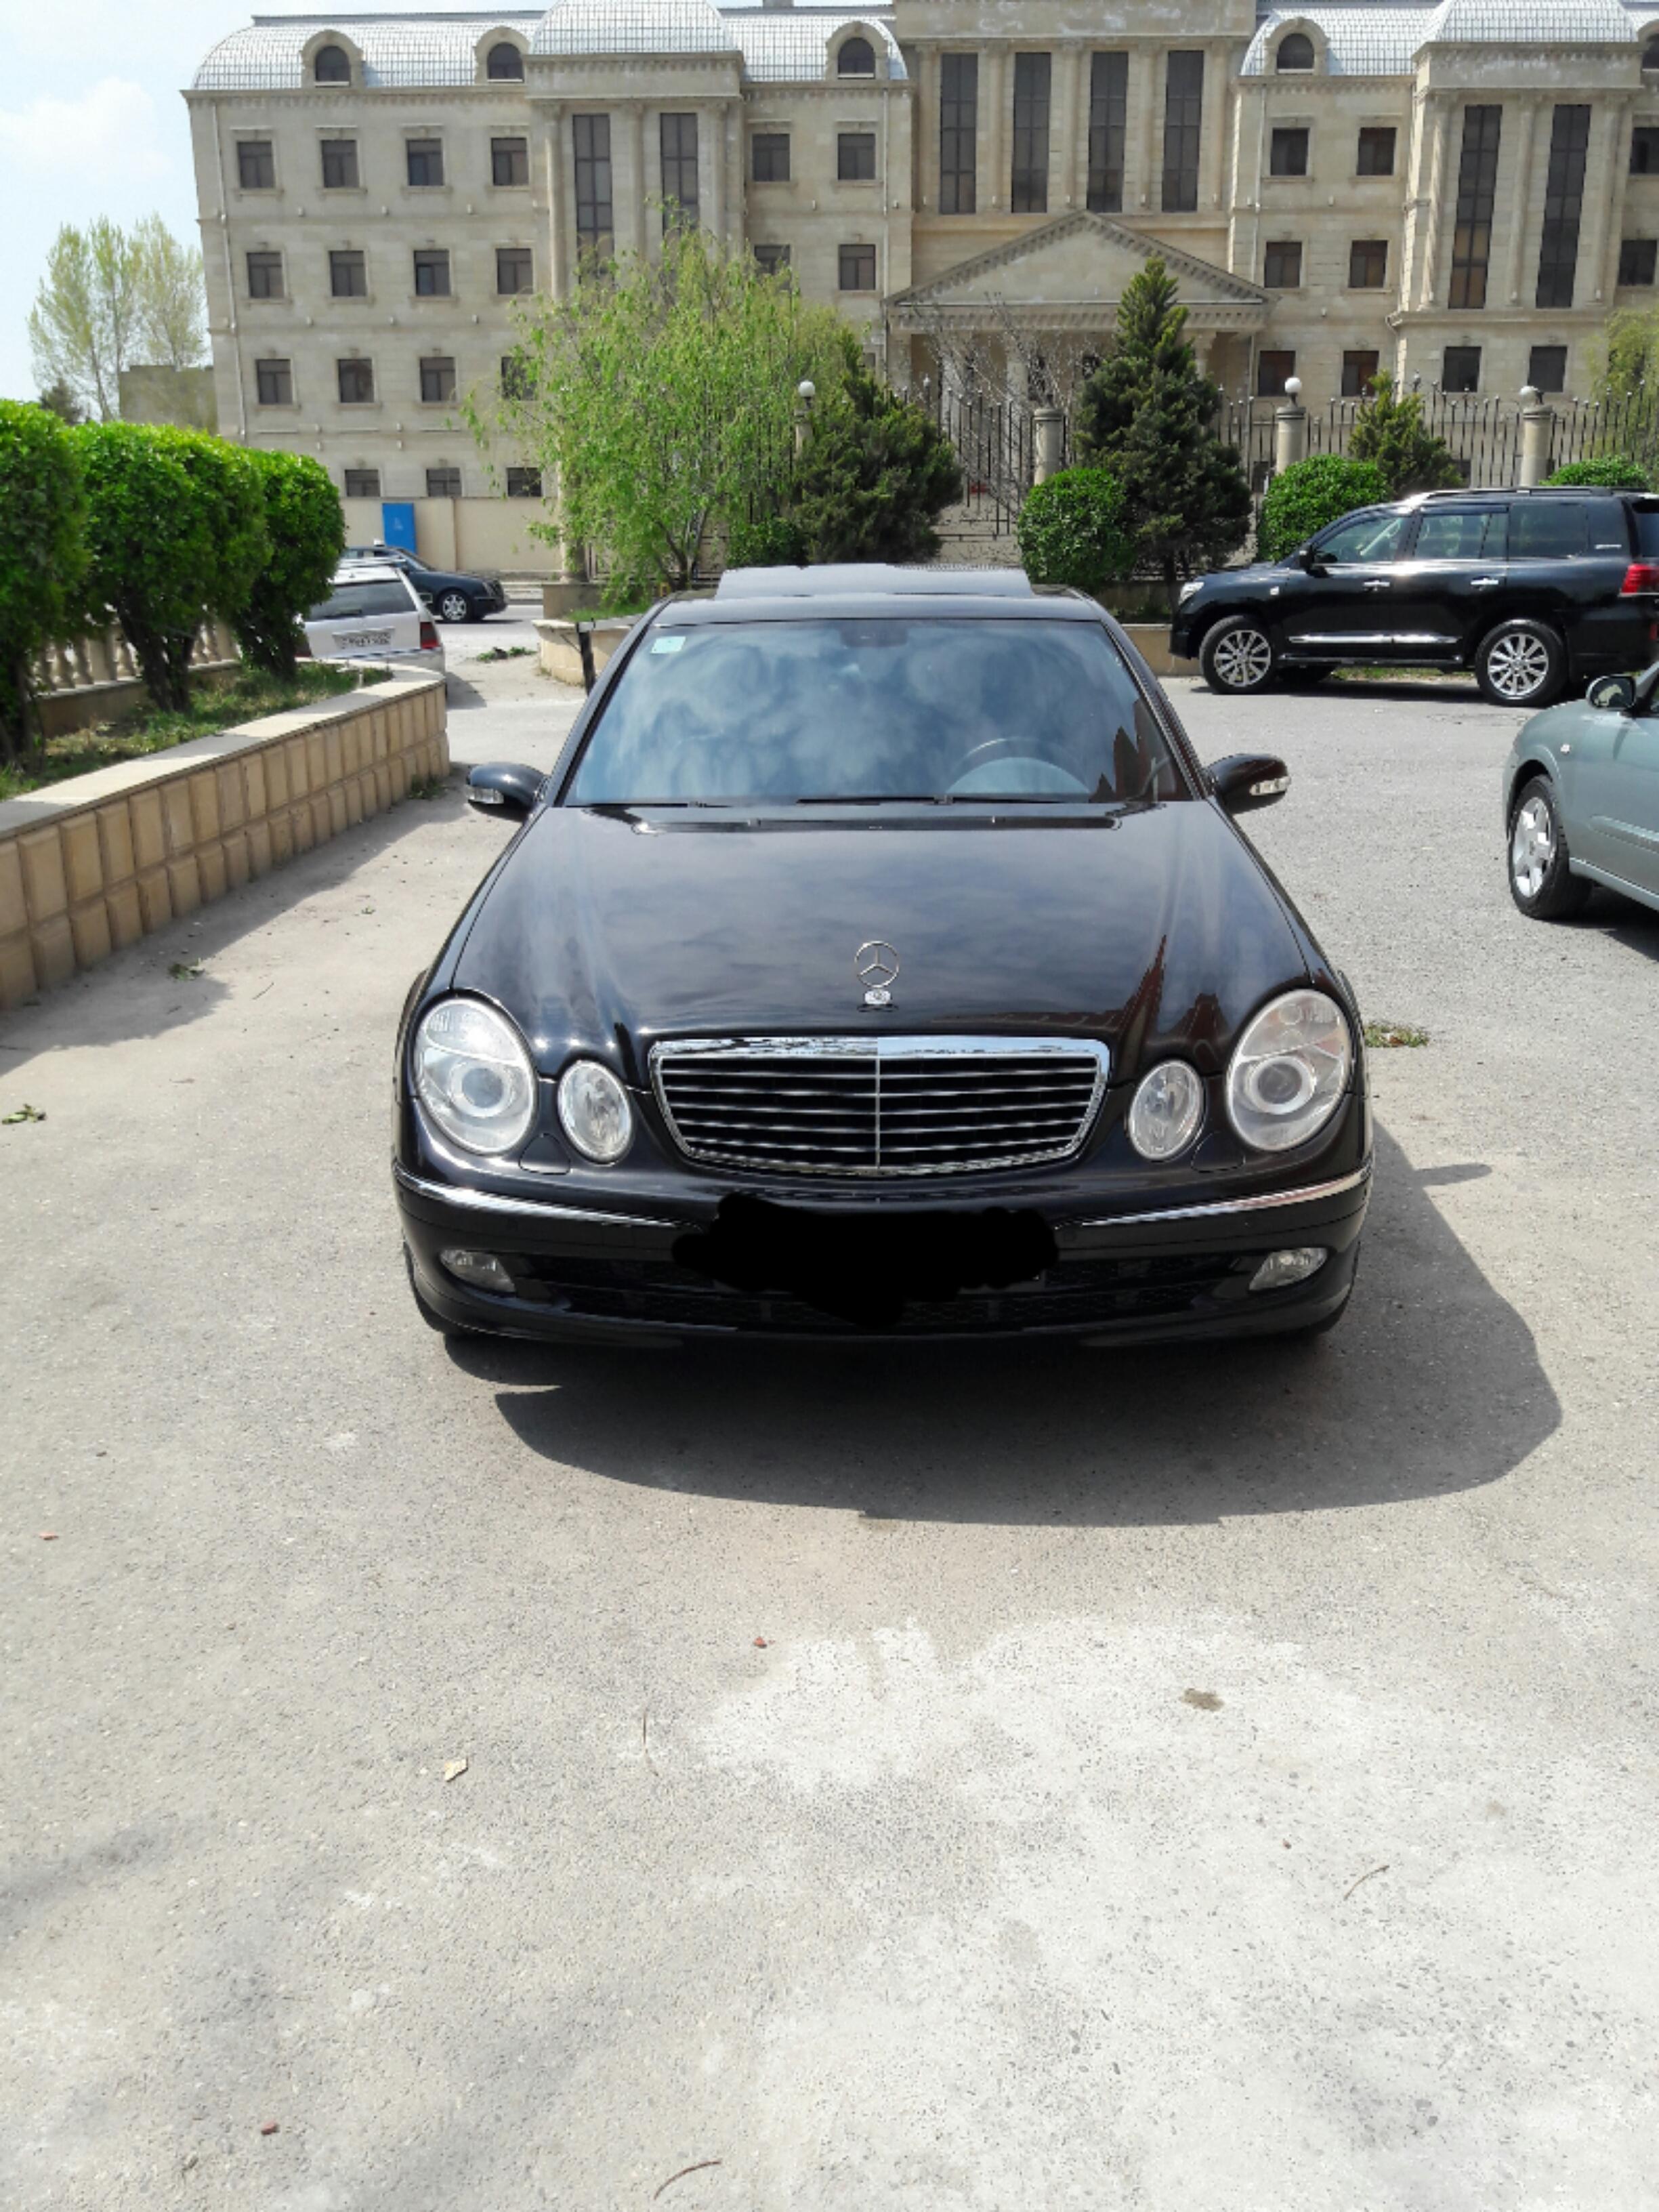 Mercedes-Benz E 320 3.2(lt) 2003 İkinci əl  $11000